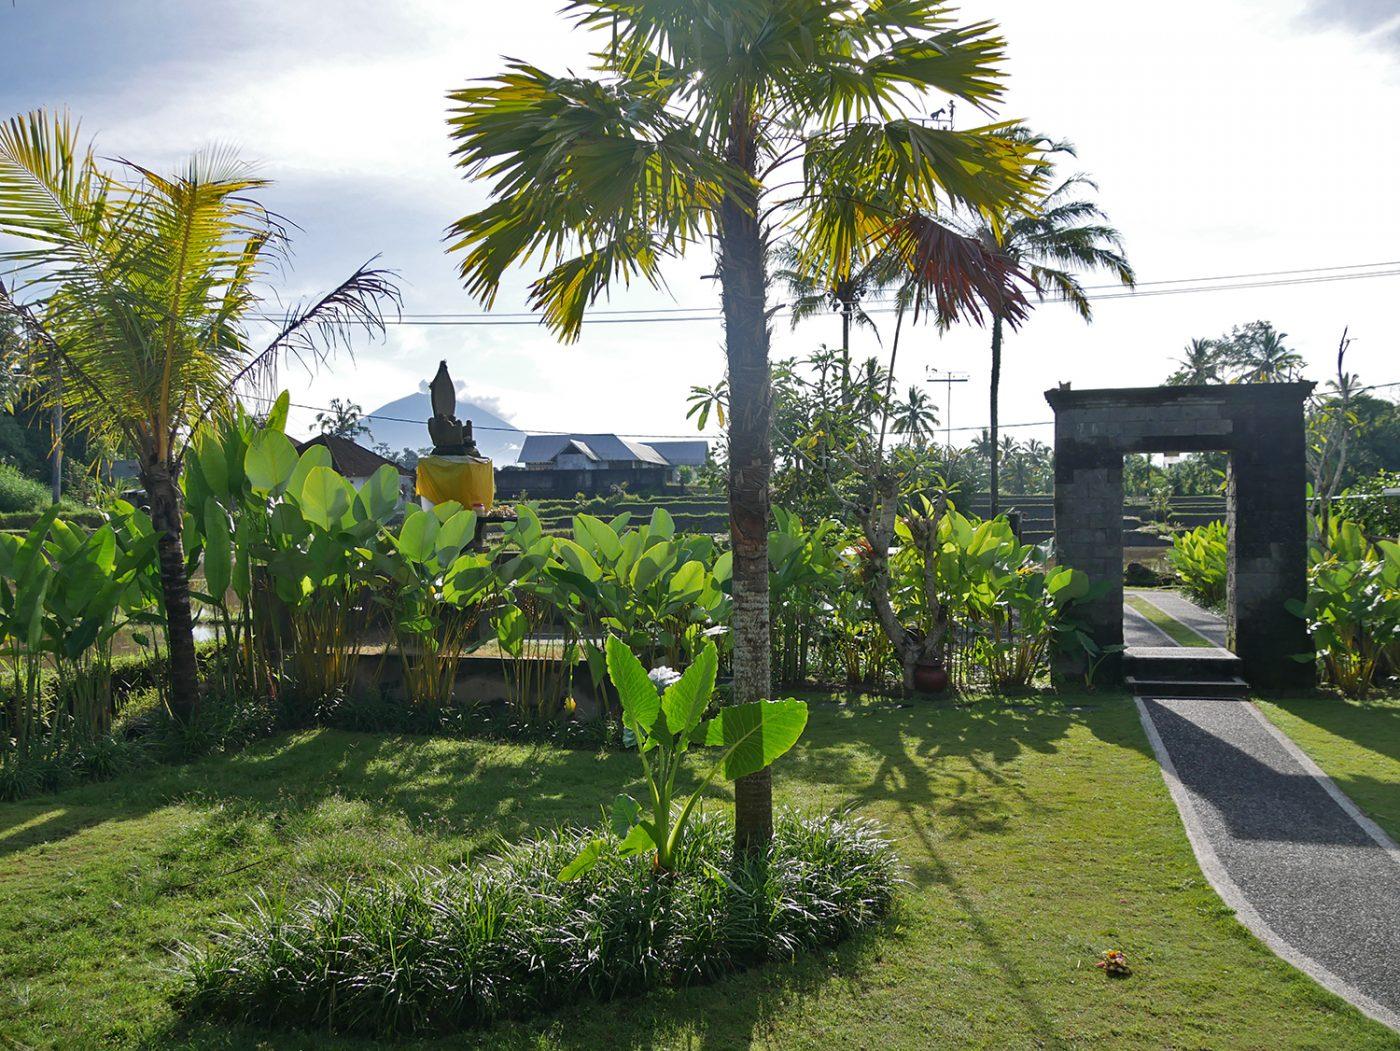 Sleeping between the rice fields in Ubud on Bali